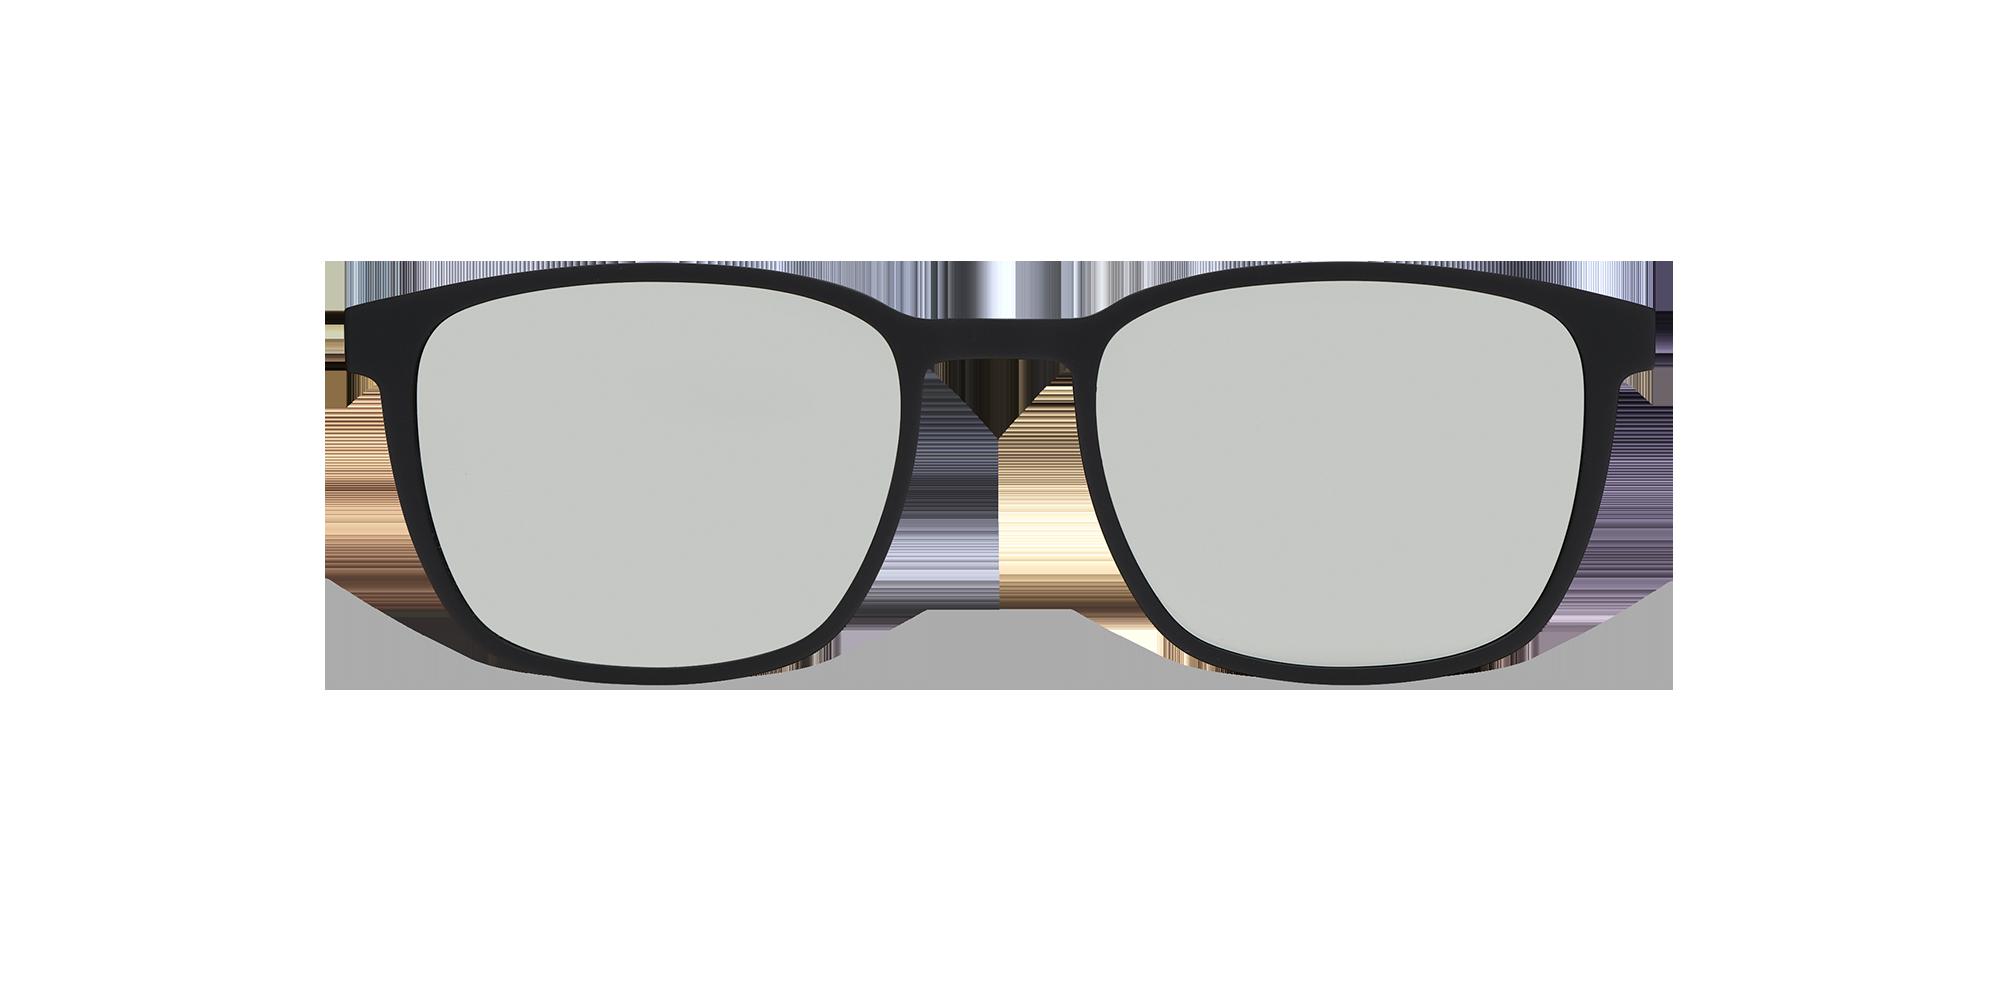 afflelou/france/products/smart_clip/clips_glasses/TMK42R3BK015319.png